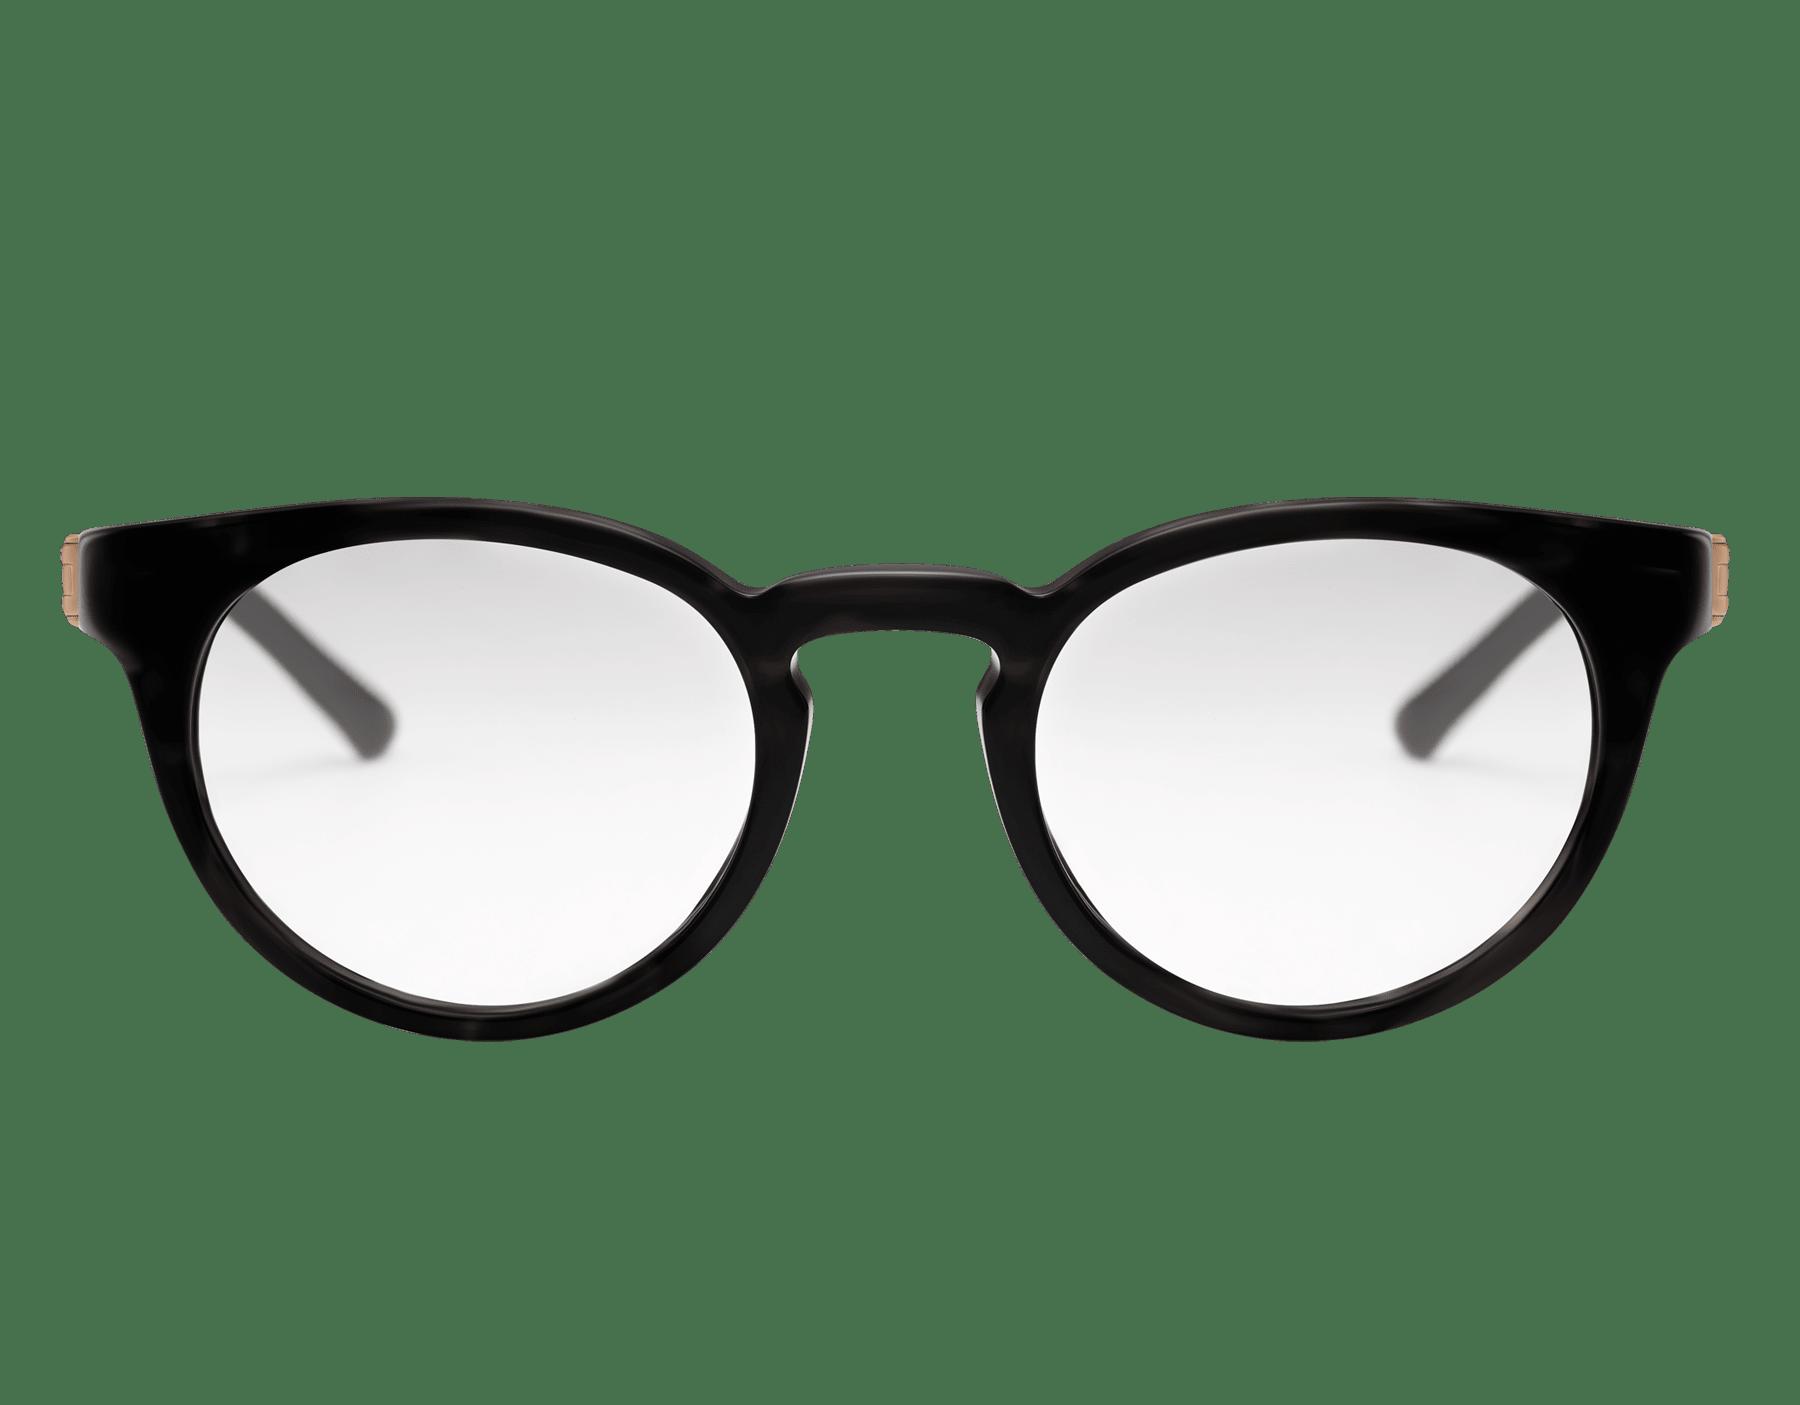 Óculos redondos Bvlgari Diagono em acetato. 903923 image 2